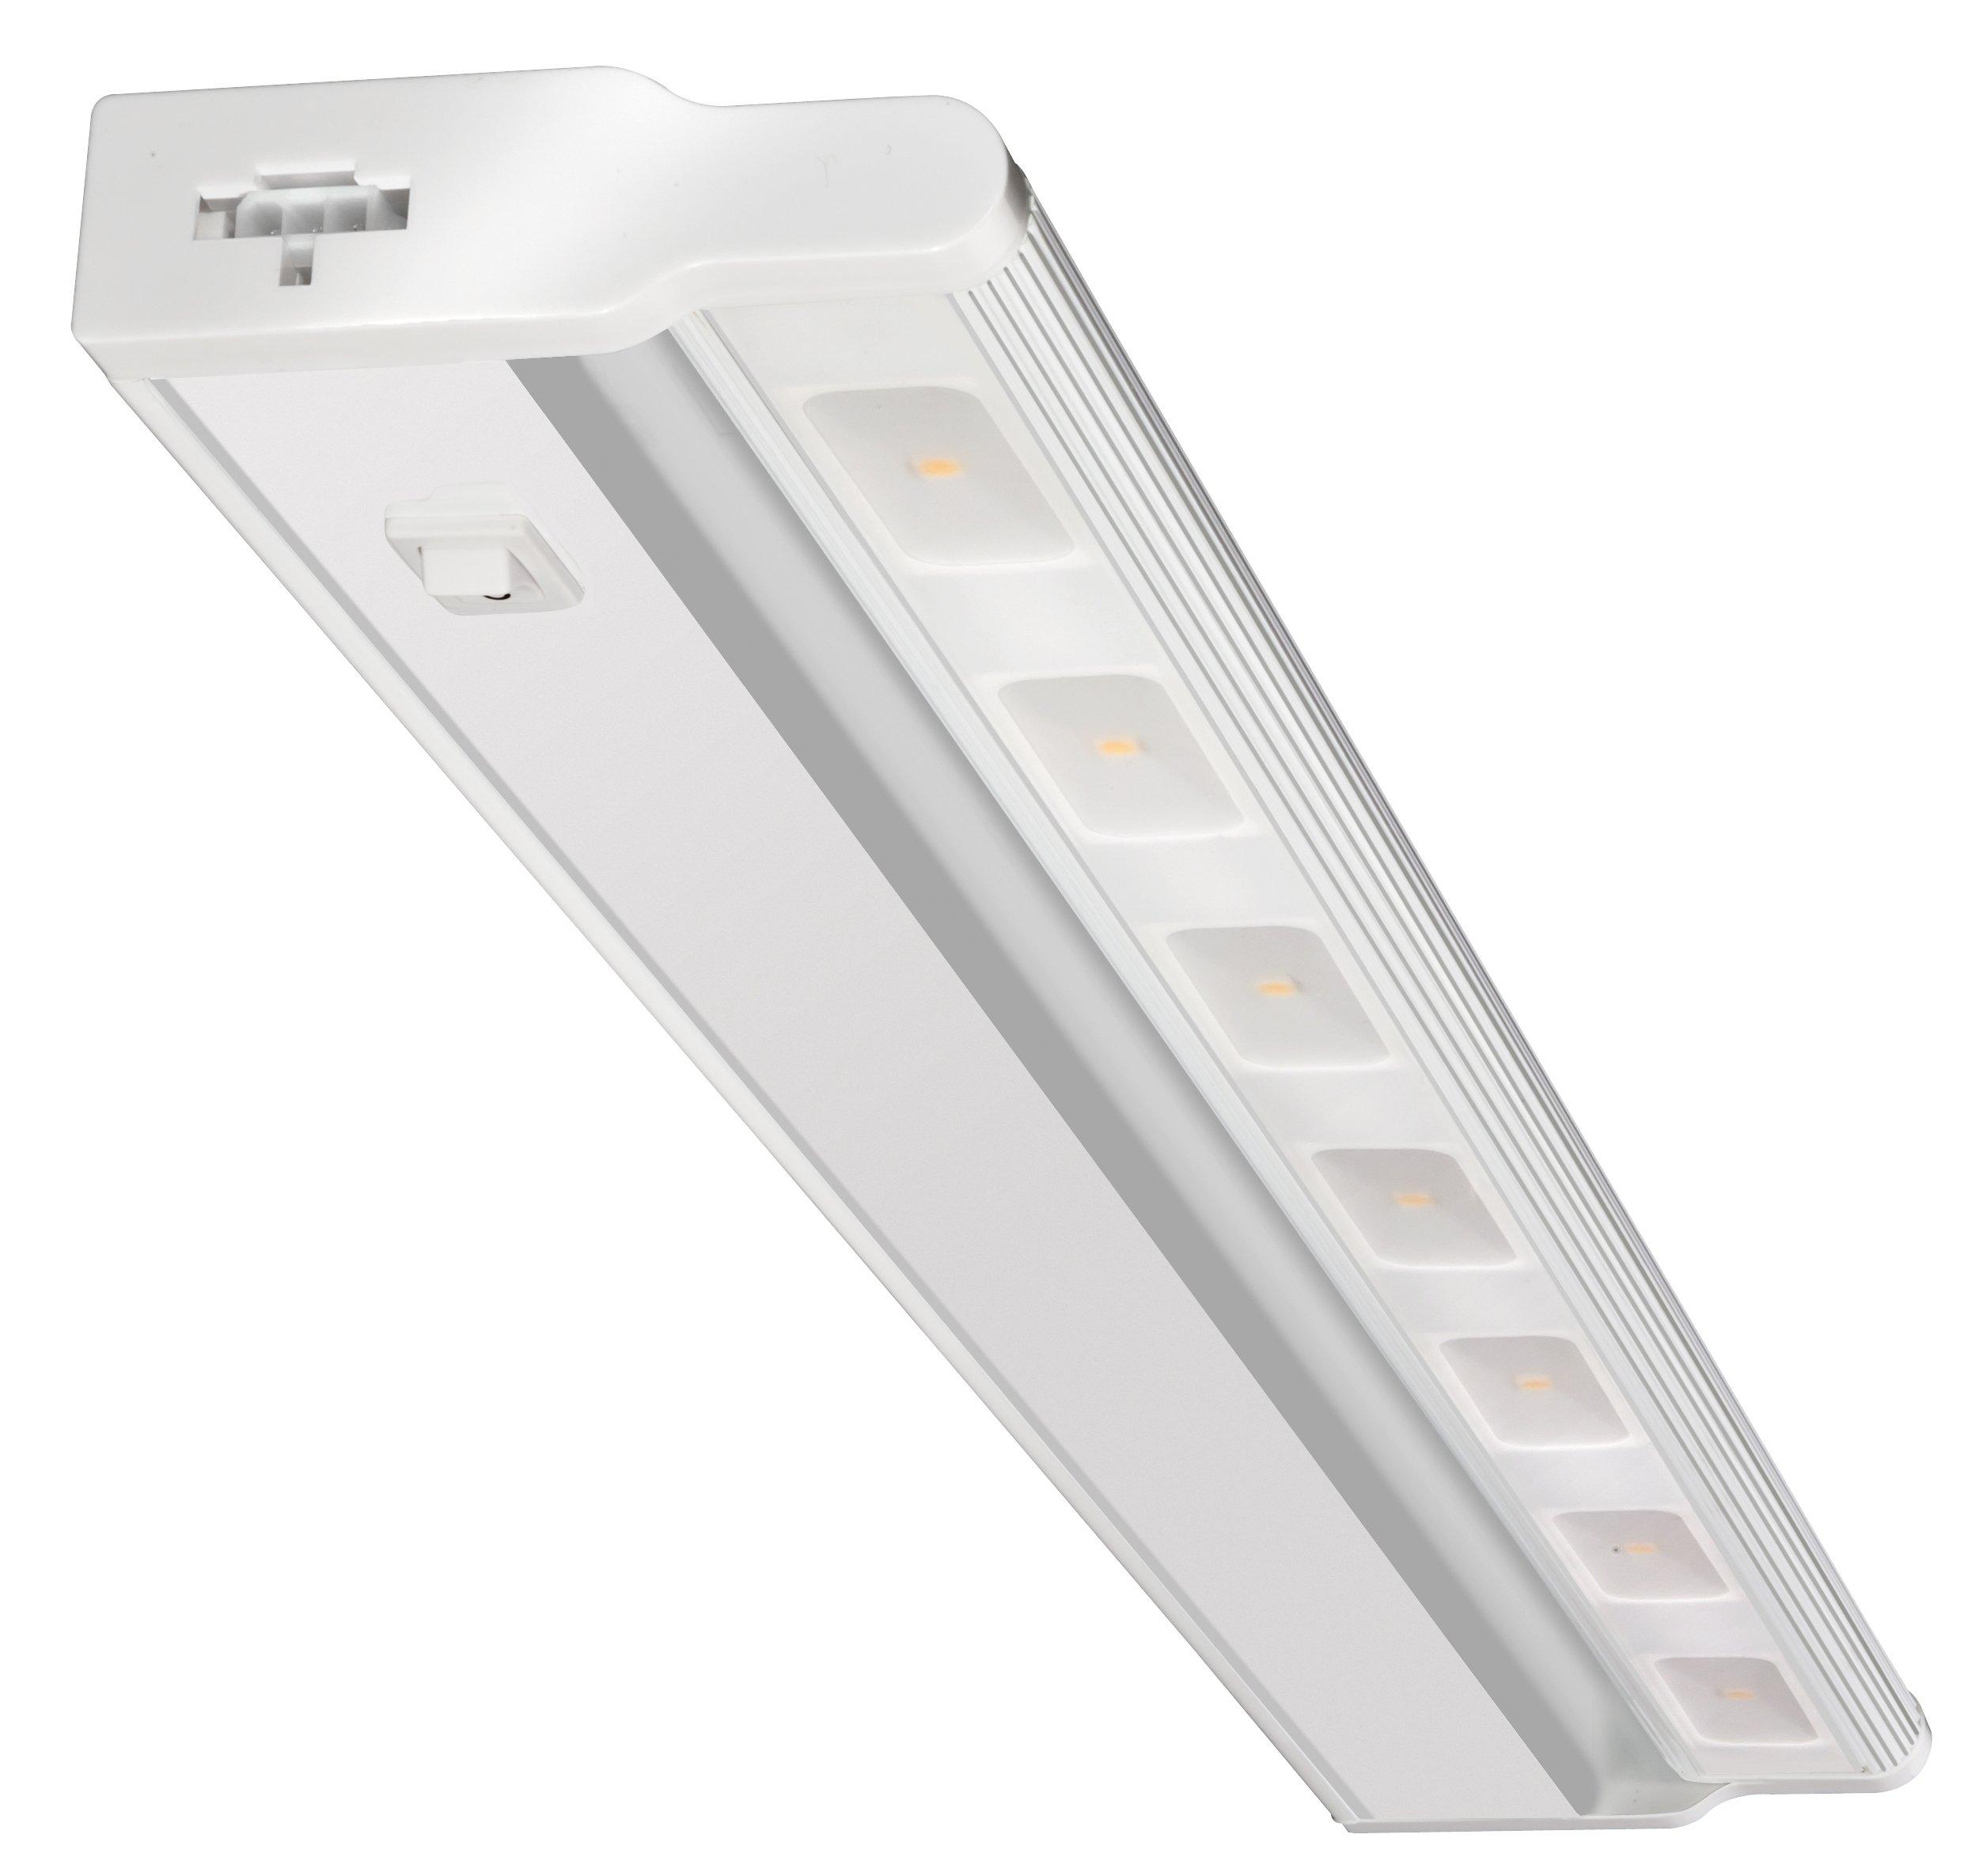 Lithonia Lighting UCLD 24 WH M4 LED Under Cabinet Light